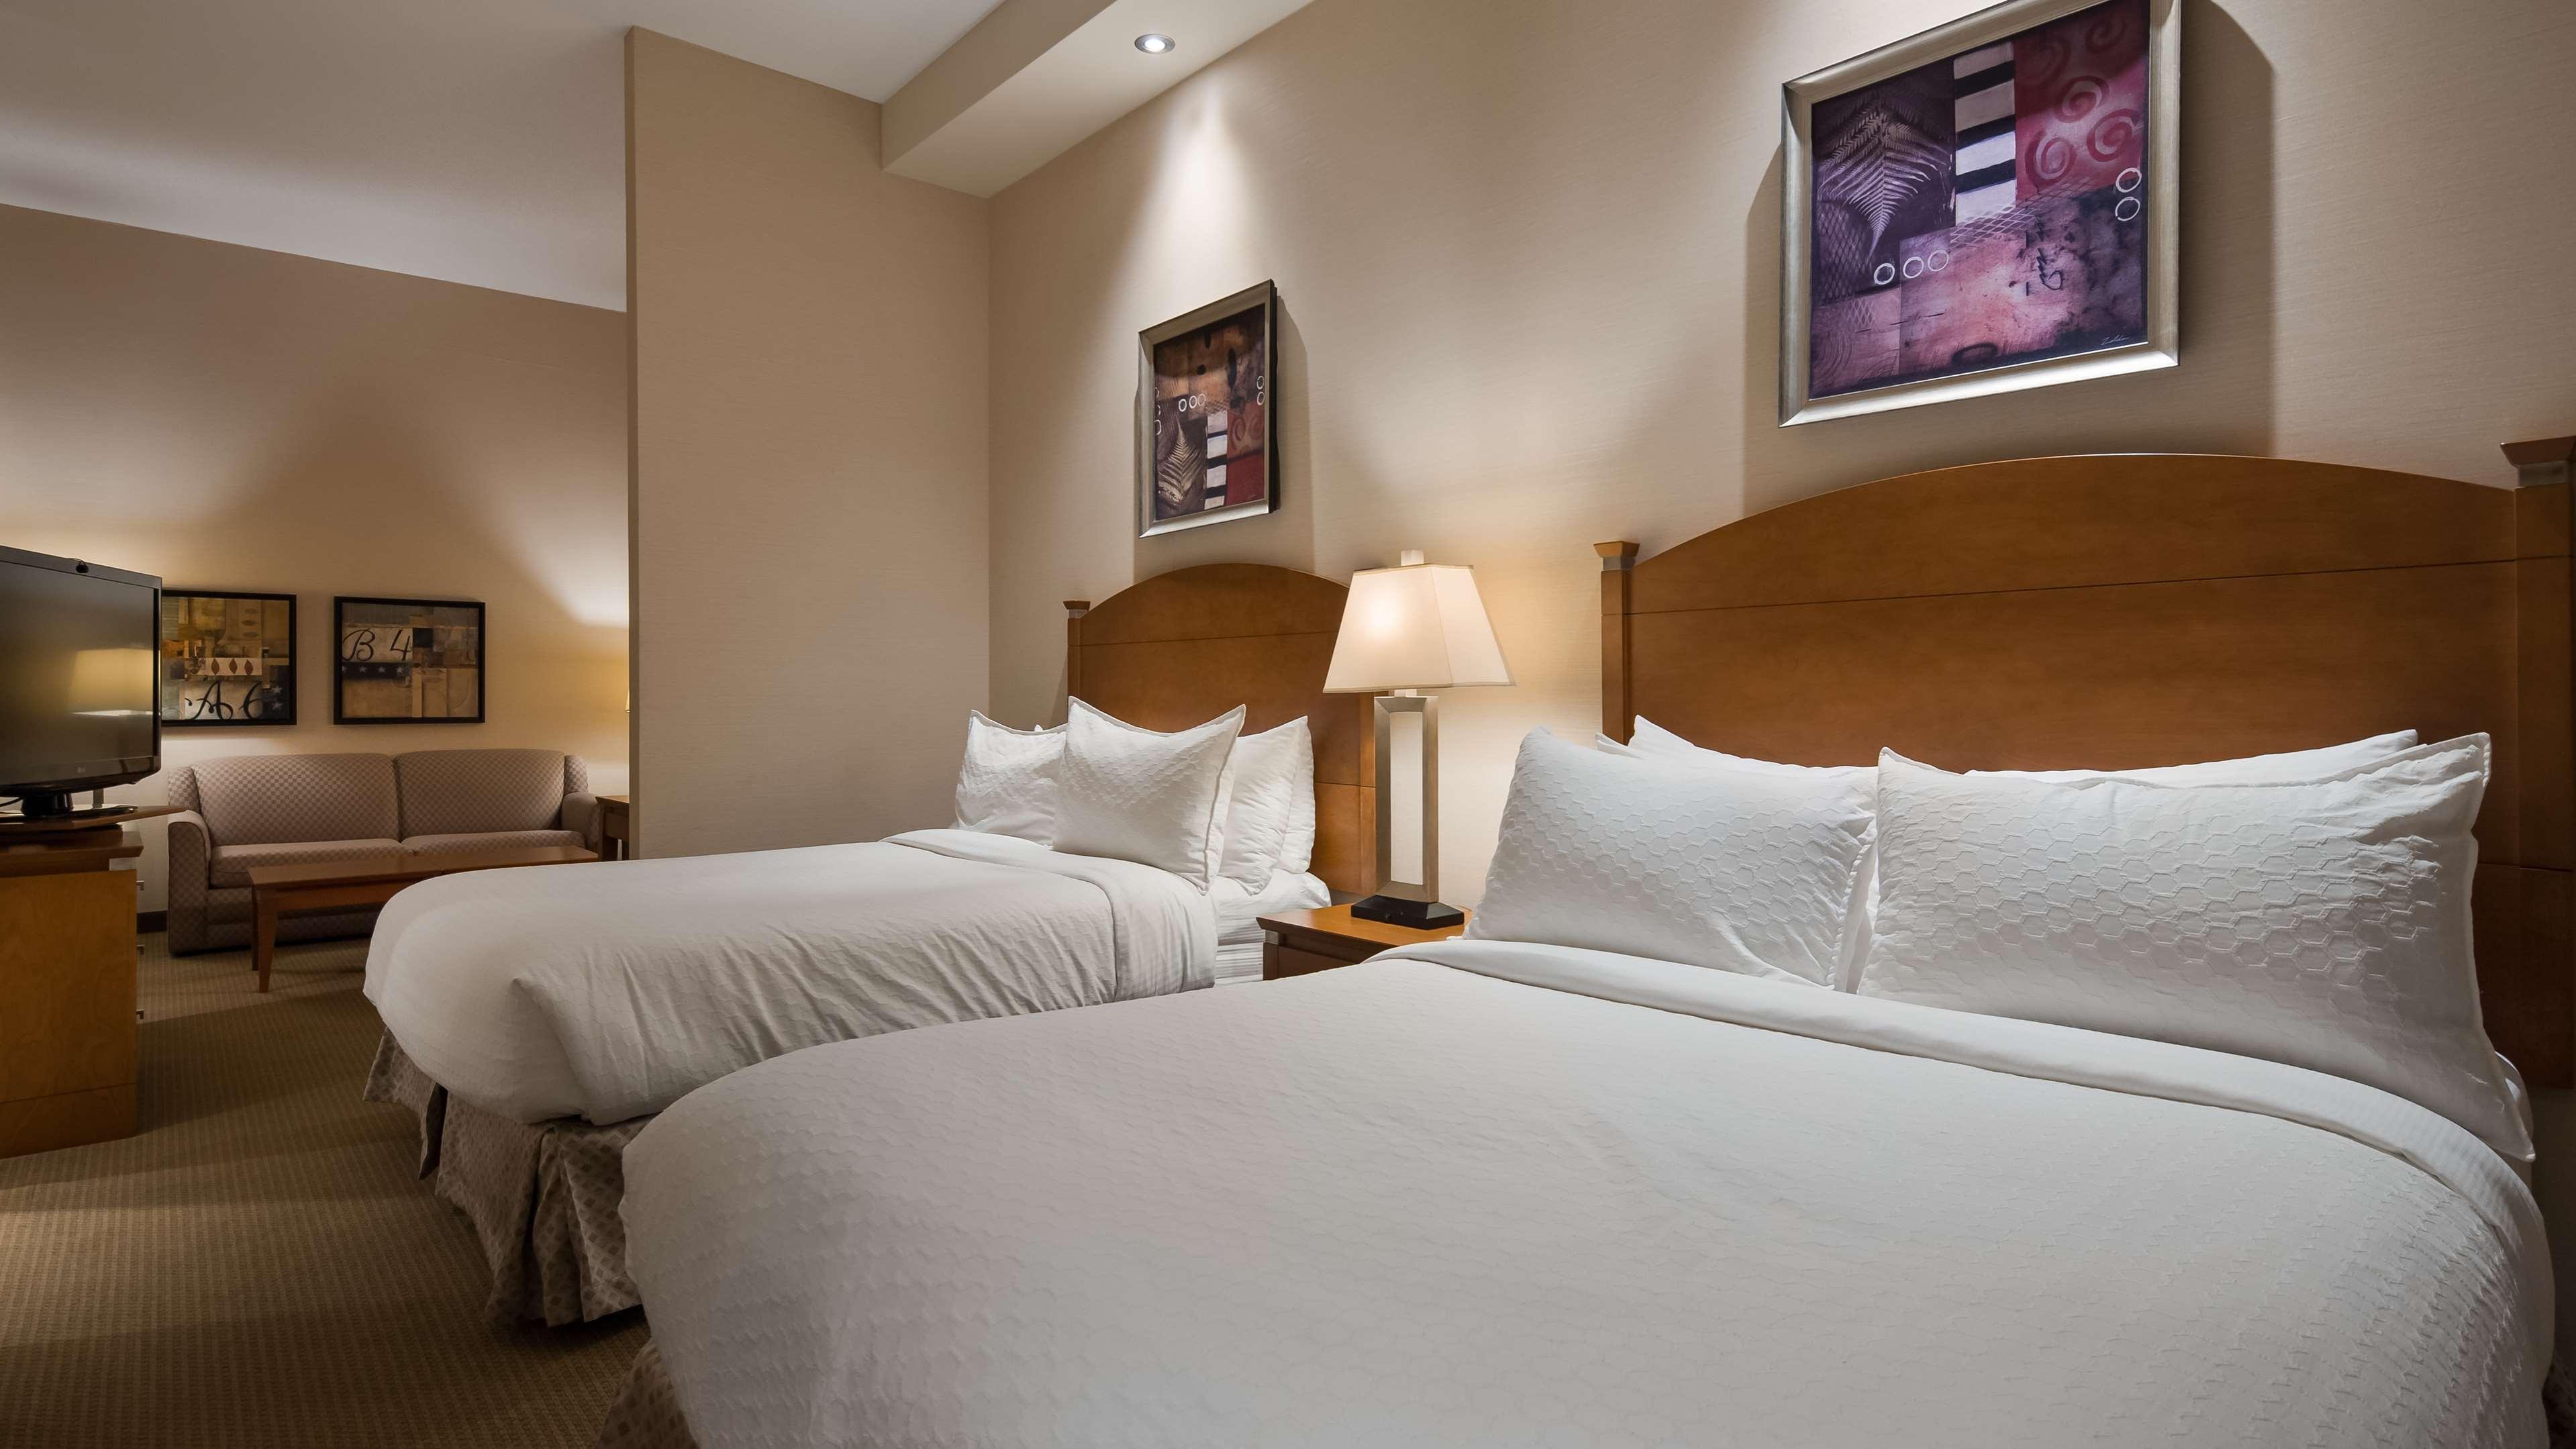 Two Queens Guest Room Best Western Plus Orangeville Inn & Suites Orangeville (519)941-3311